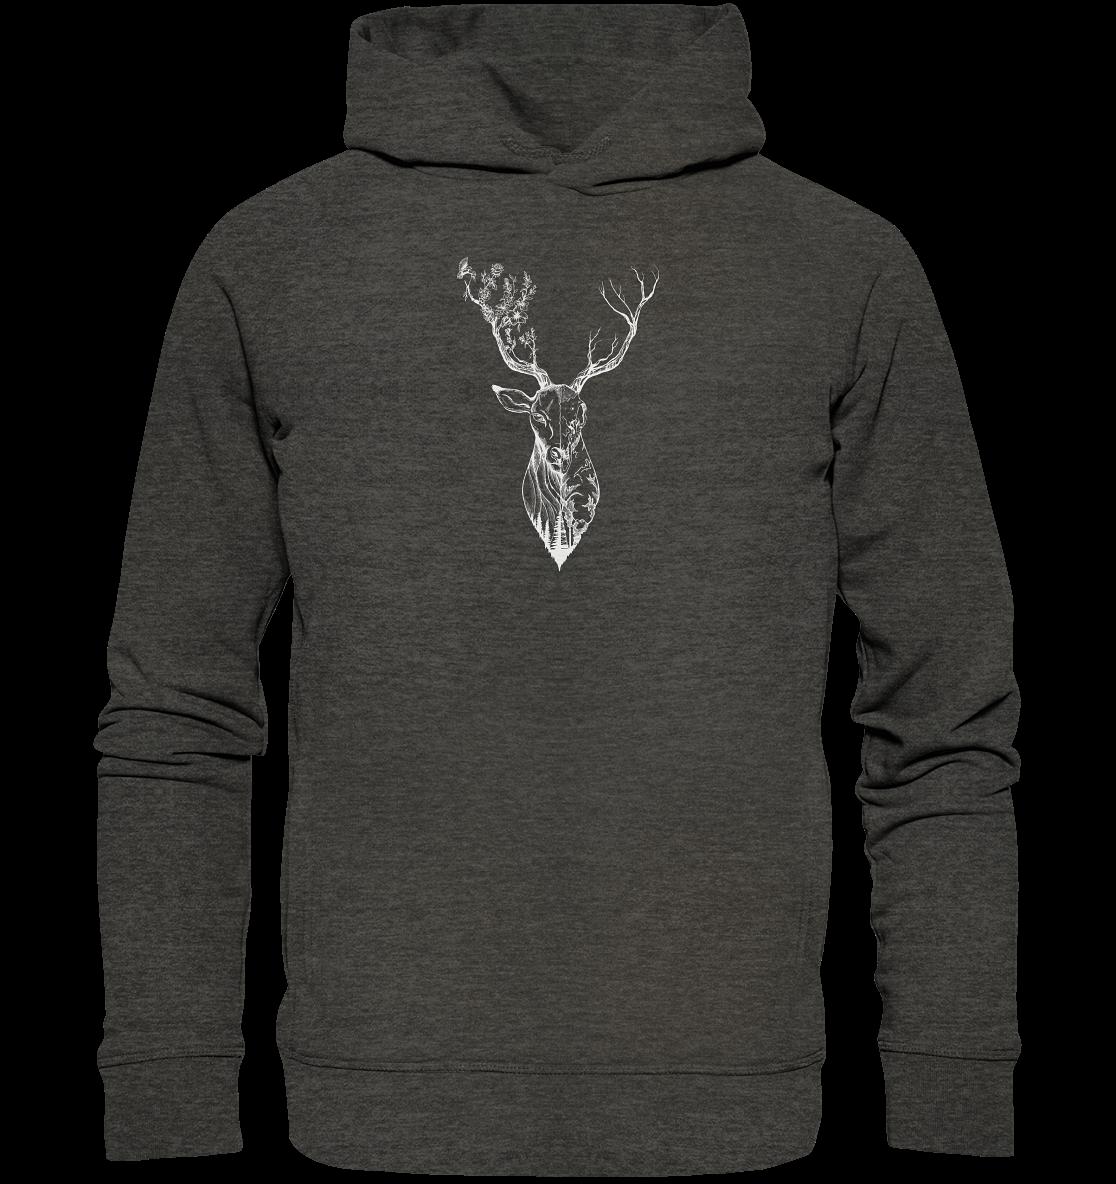 front-organic-fashion-hoodie-252625-1116x-7.png